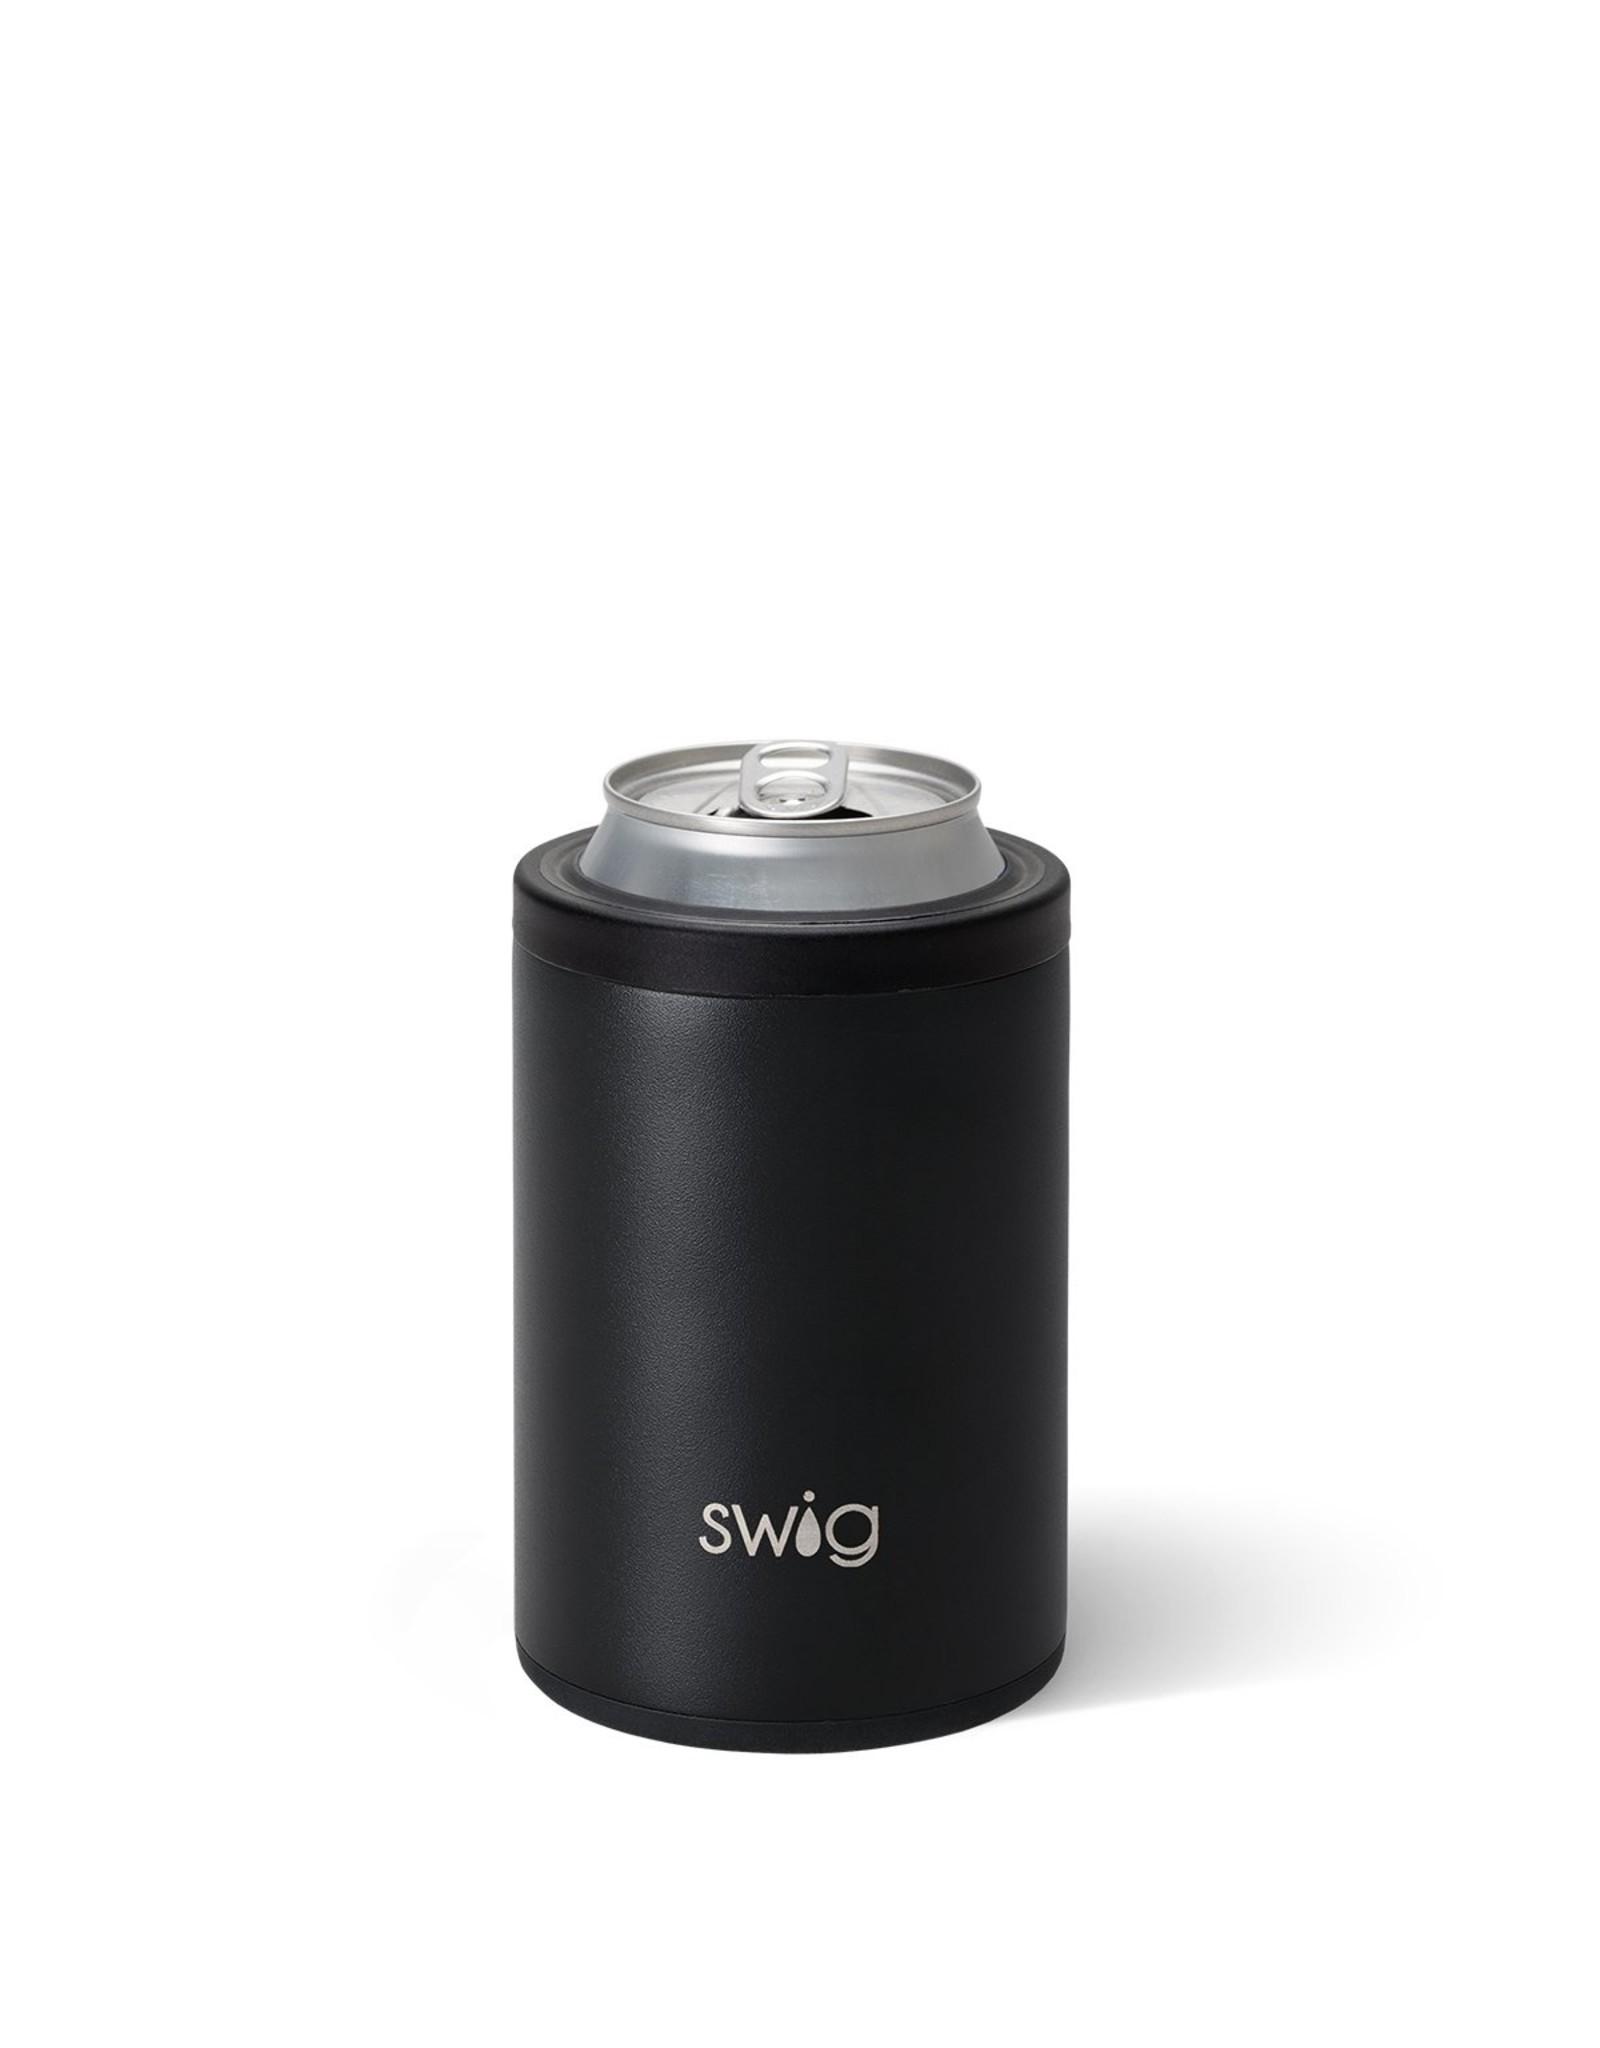 Swig 12 oz Combo Can Cooler - Matte Black